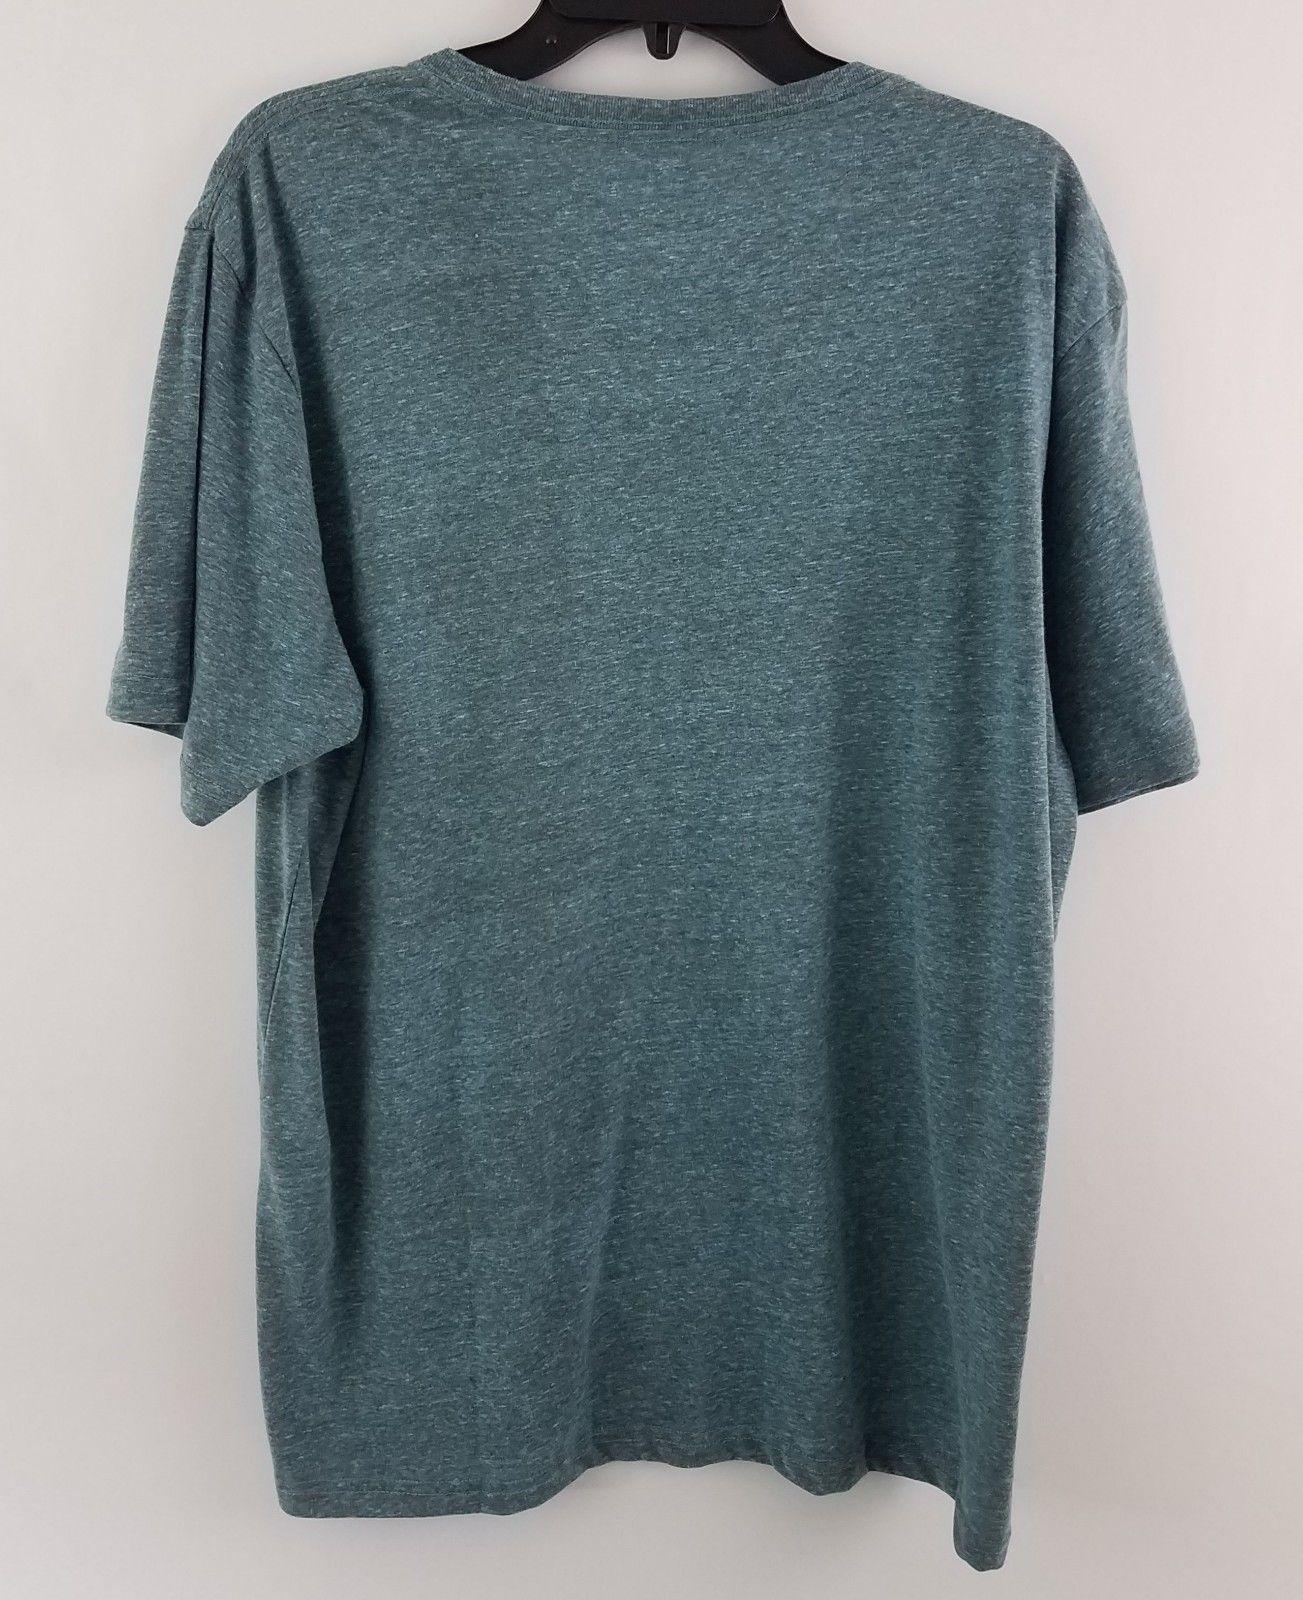 American Rag Cie Men's Tri Blend T-Shirt Barbados Blue 152536 image 3